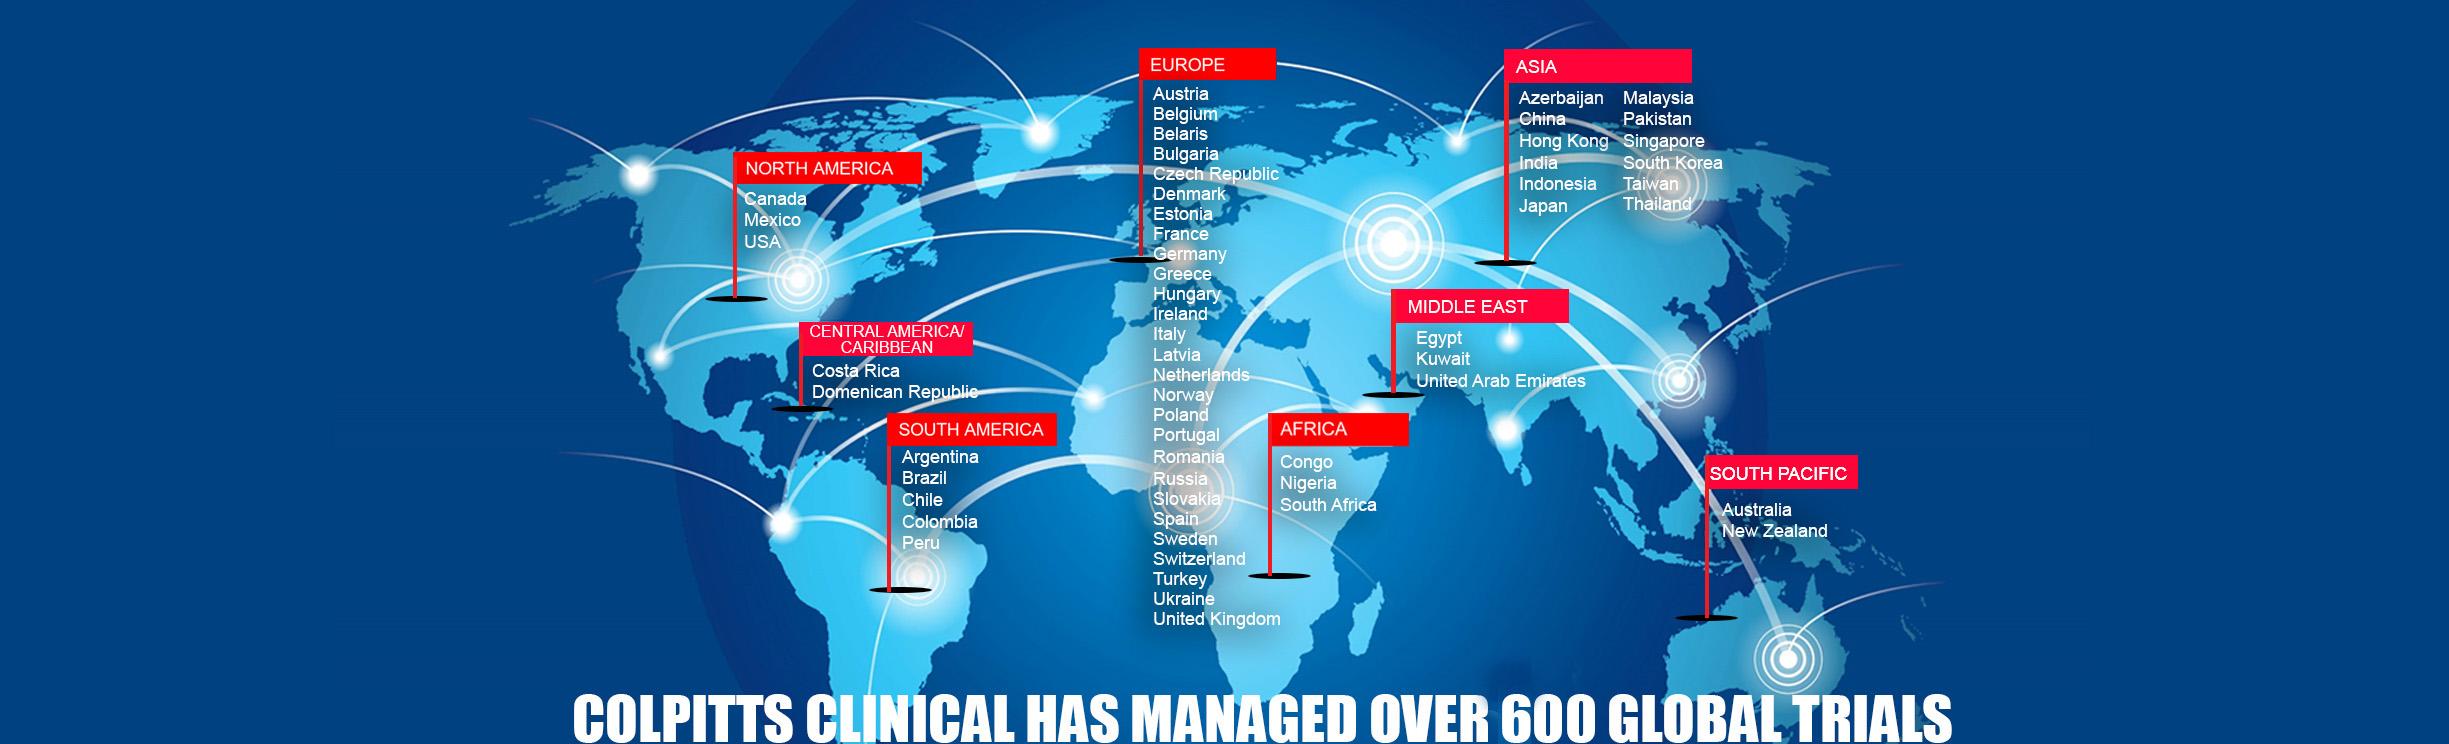 global trials